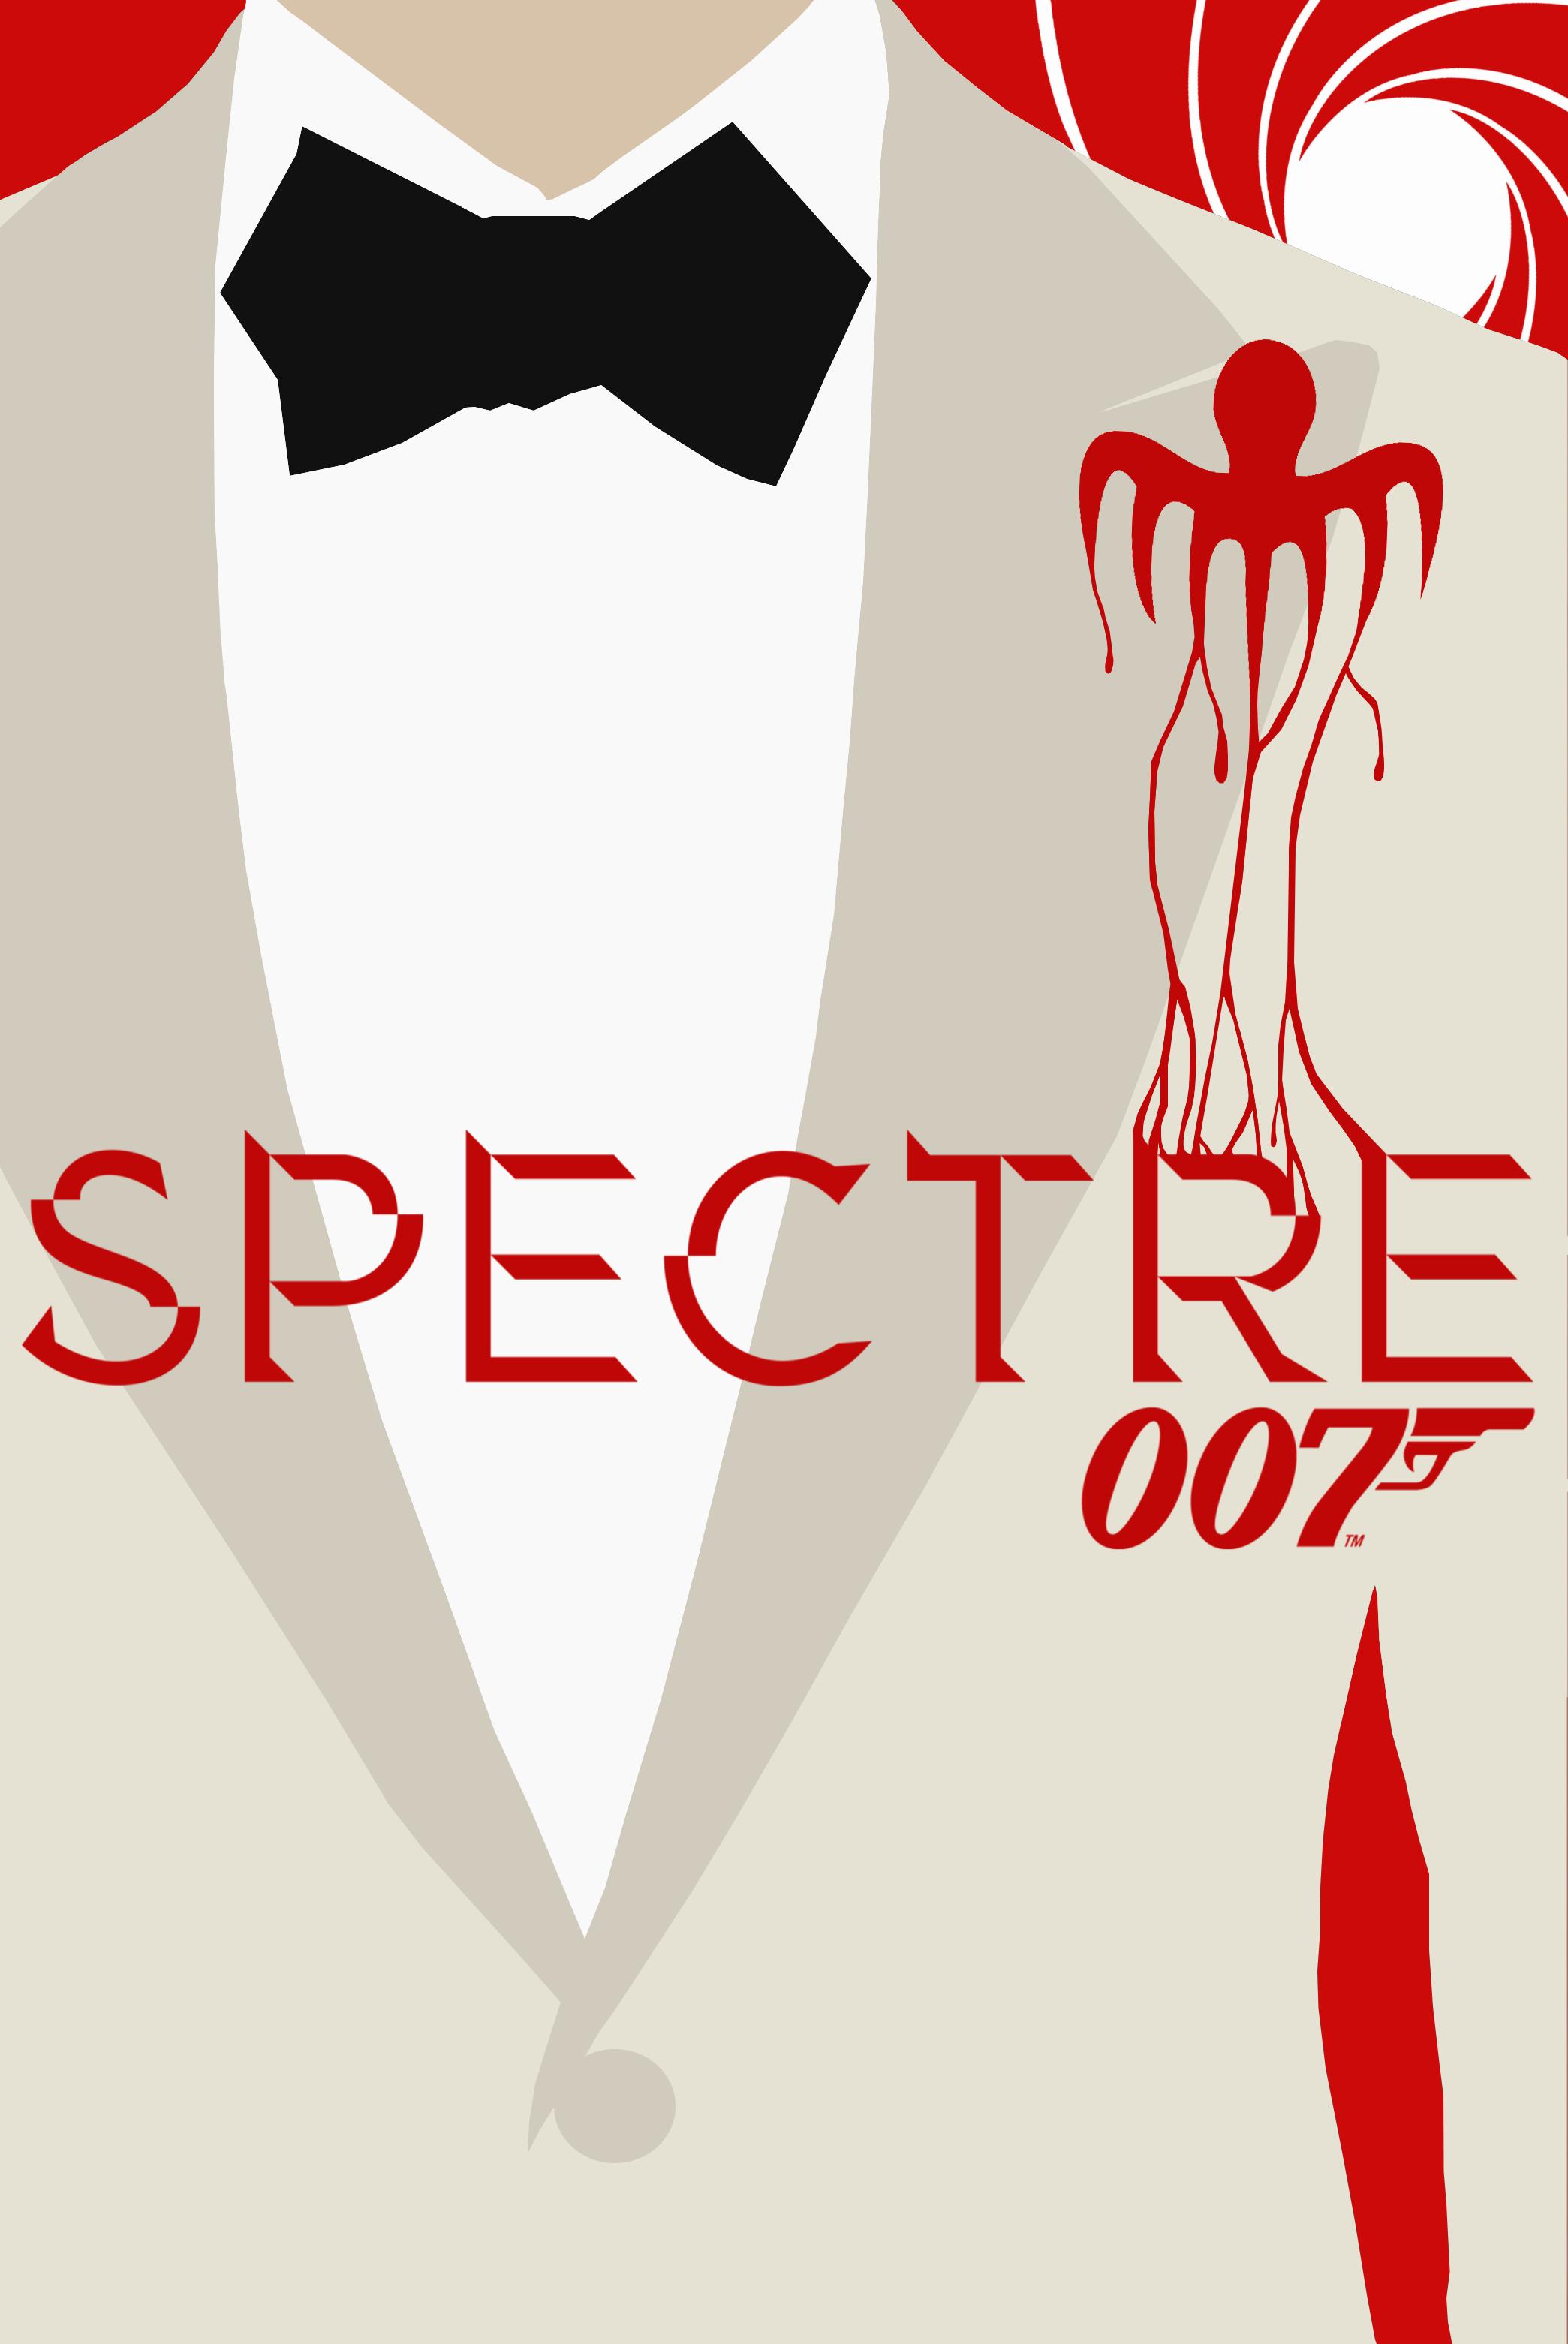 spectre_tuxedo_poster__3_by_bradymajor-d9kppq5.jpg